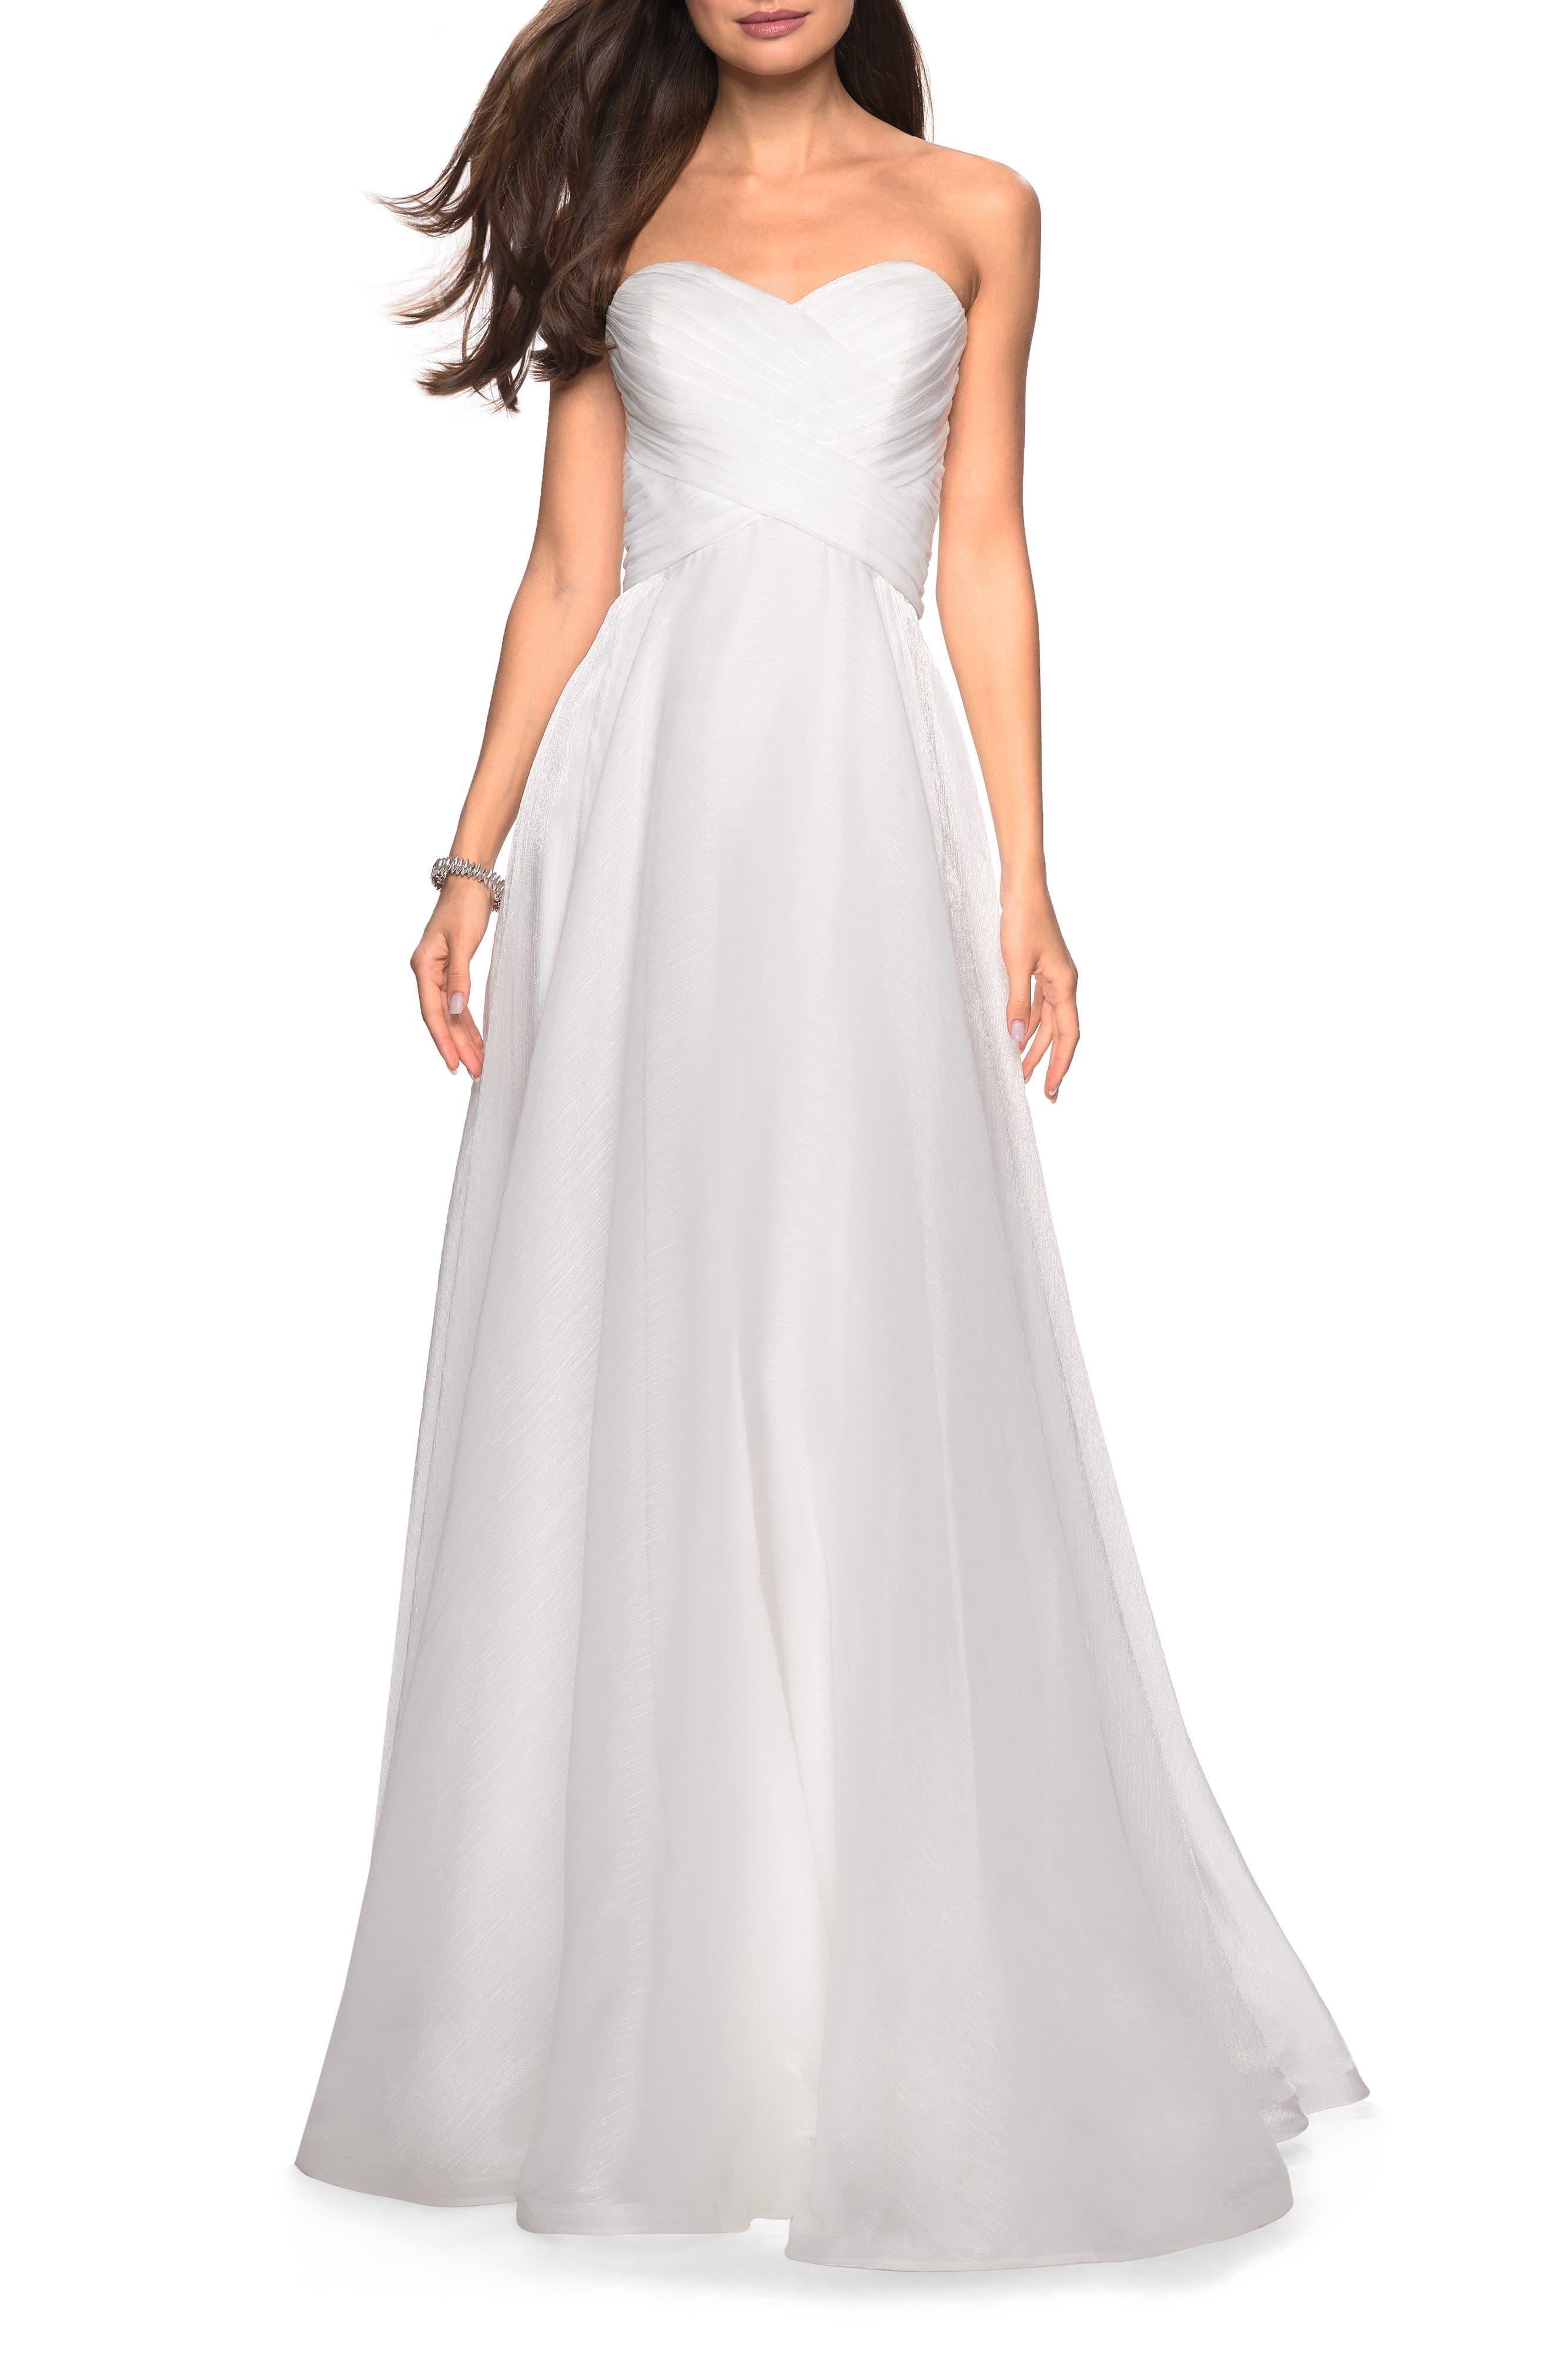 LA FEMME, Strapless Metallic Chiffon Evening Dress, Main thumbnail 1, color, WHITE